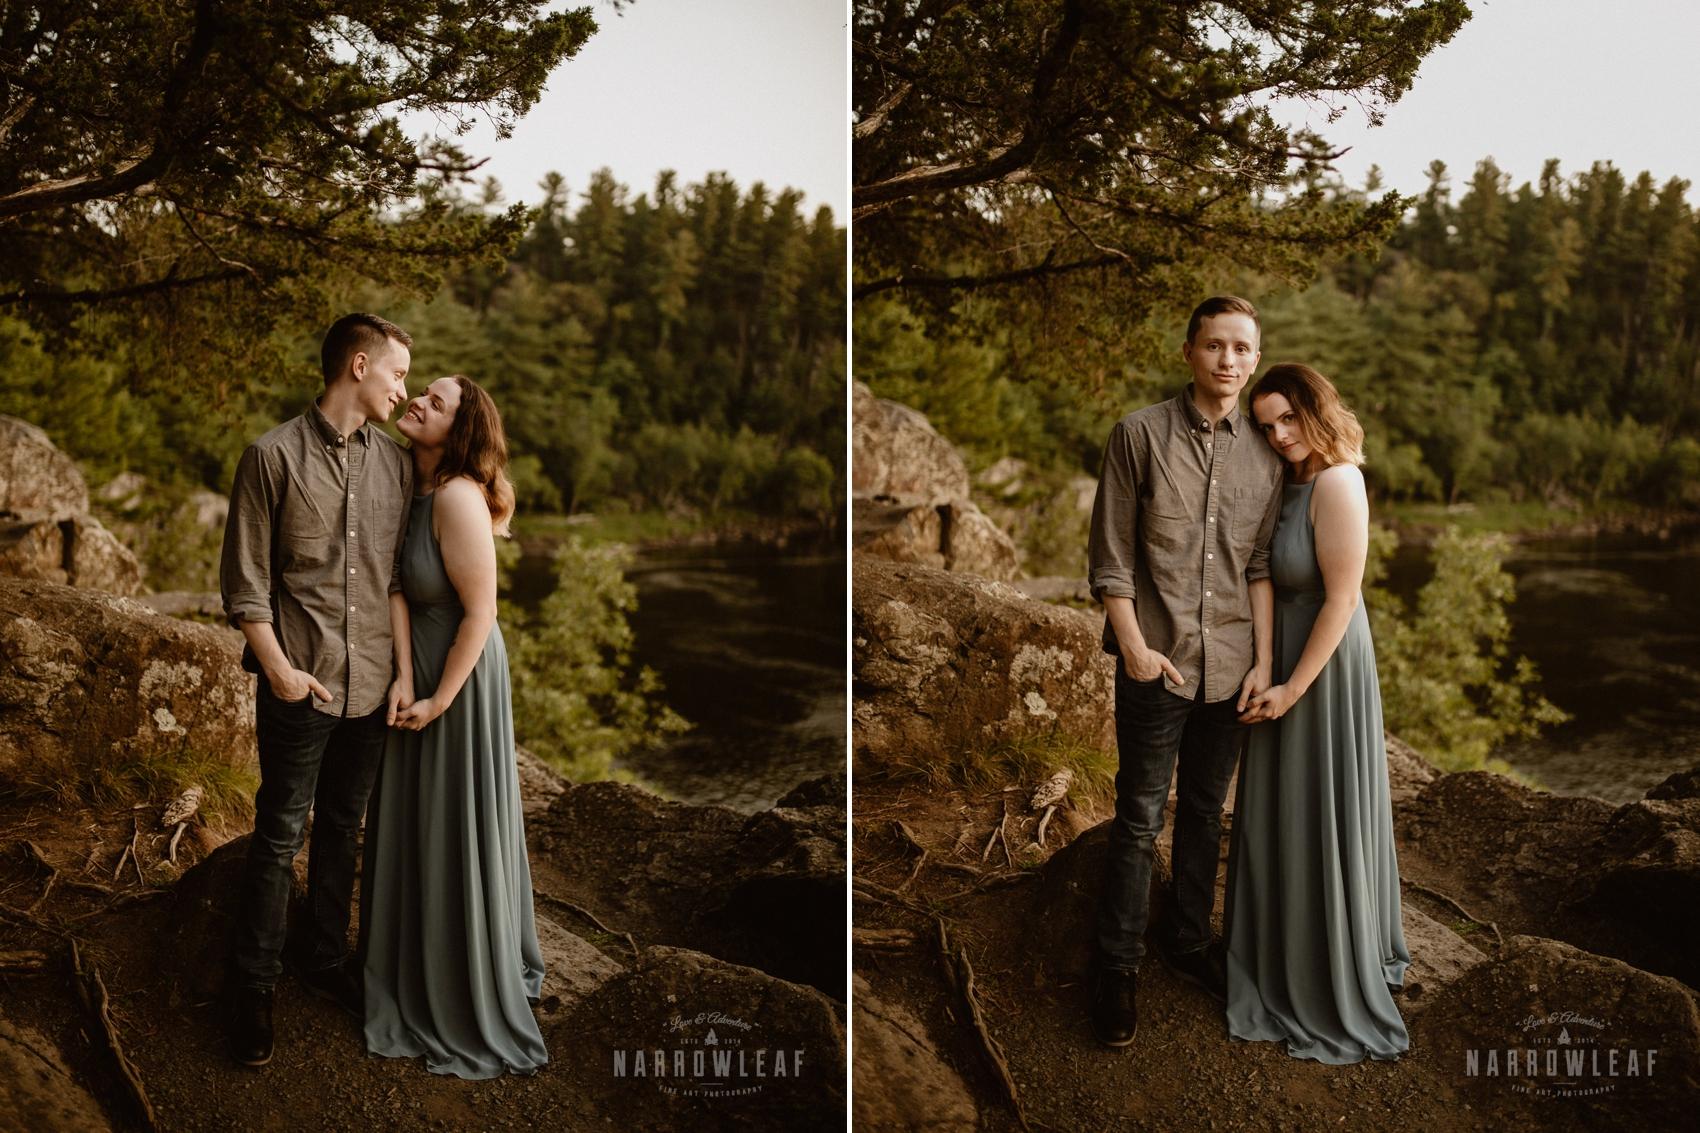 Interstate-Park-engagement-photographer-013-014.jpg